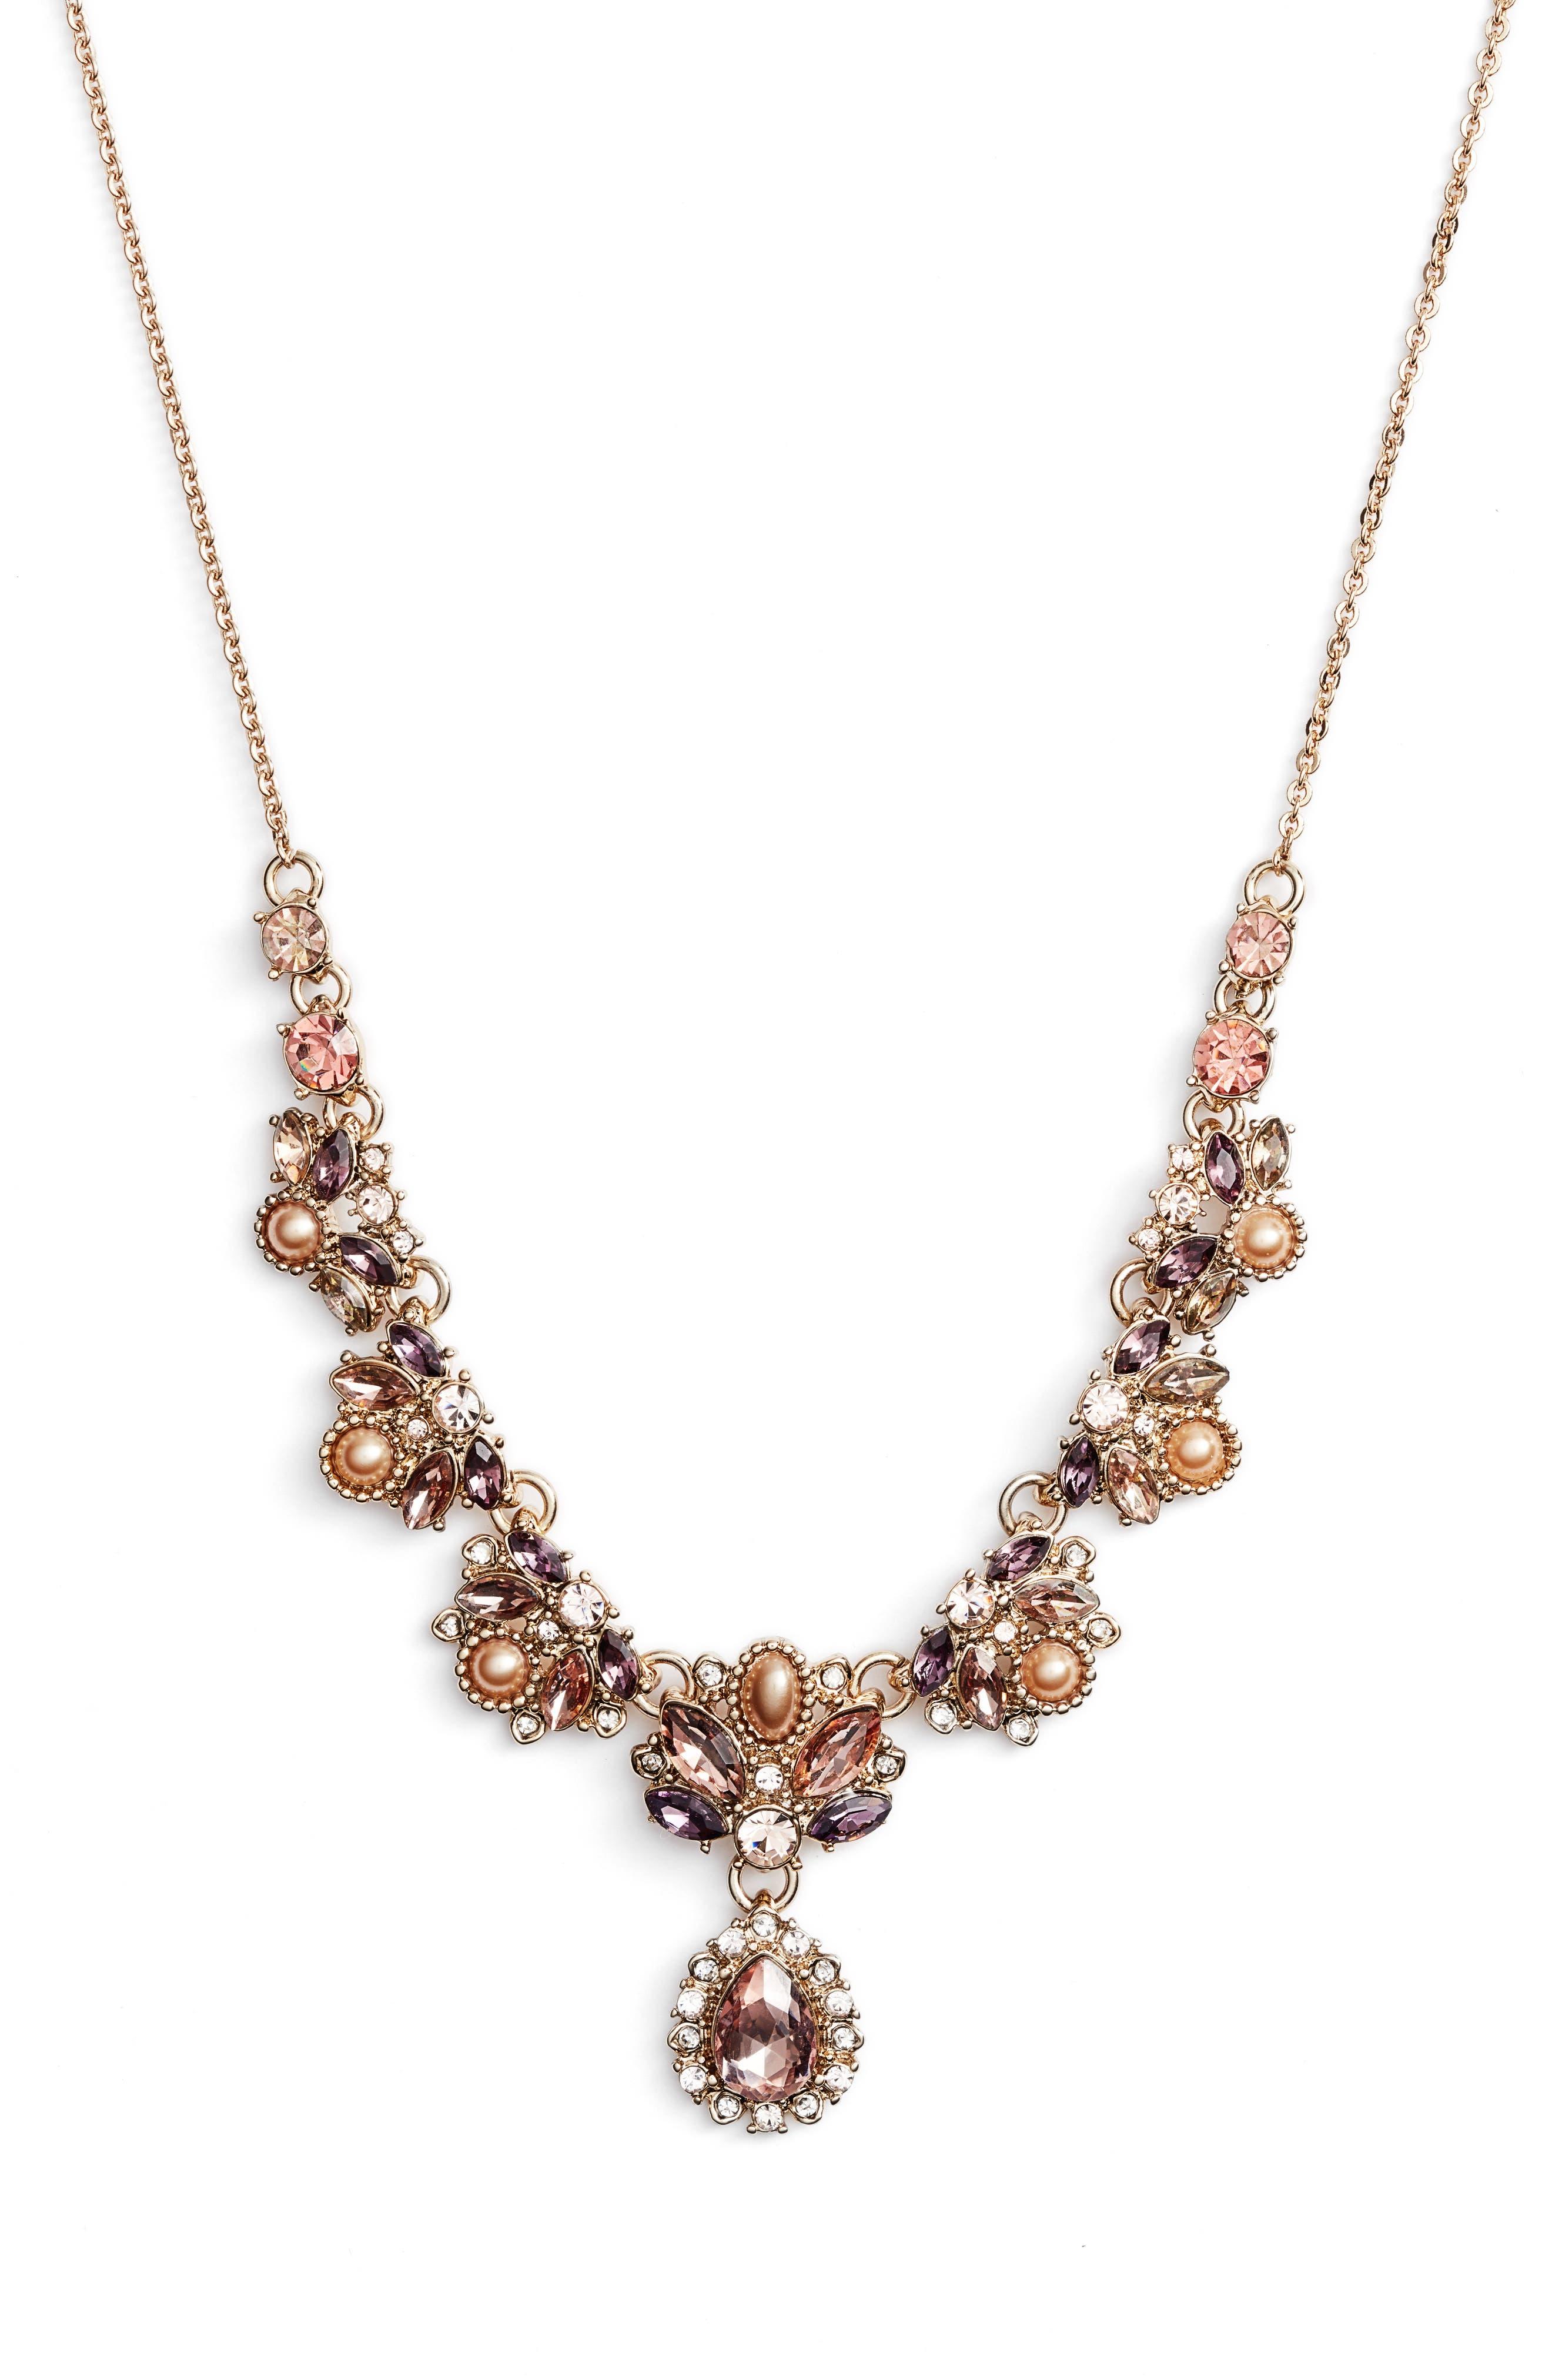 MARCHESA, Crystal & Imitation Pearl Necklace, Main thumbnail 1, color, GOLD/ BLUSH/ PURPLE